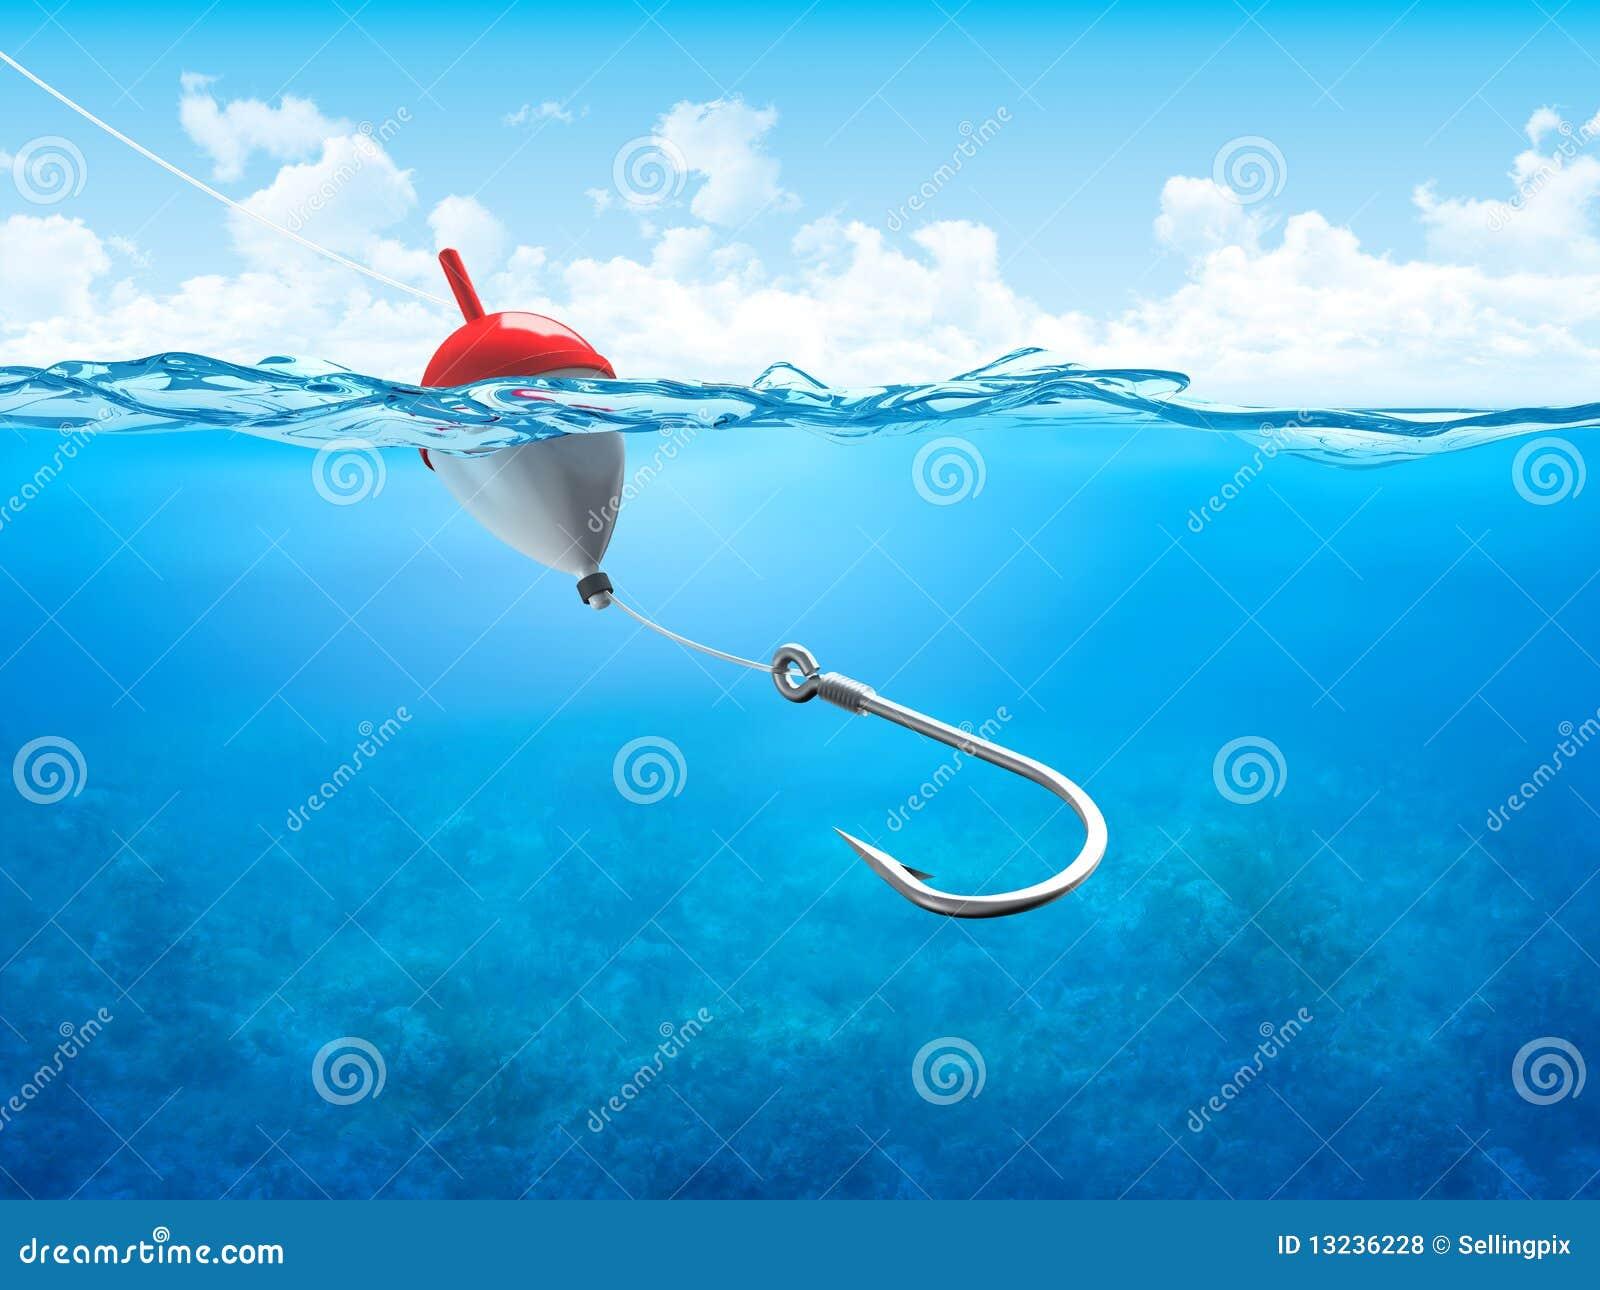 float, fishing line and hook underwater vertical royalty free, Reel Combo